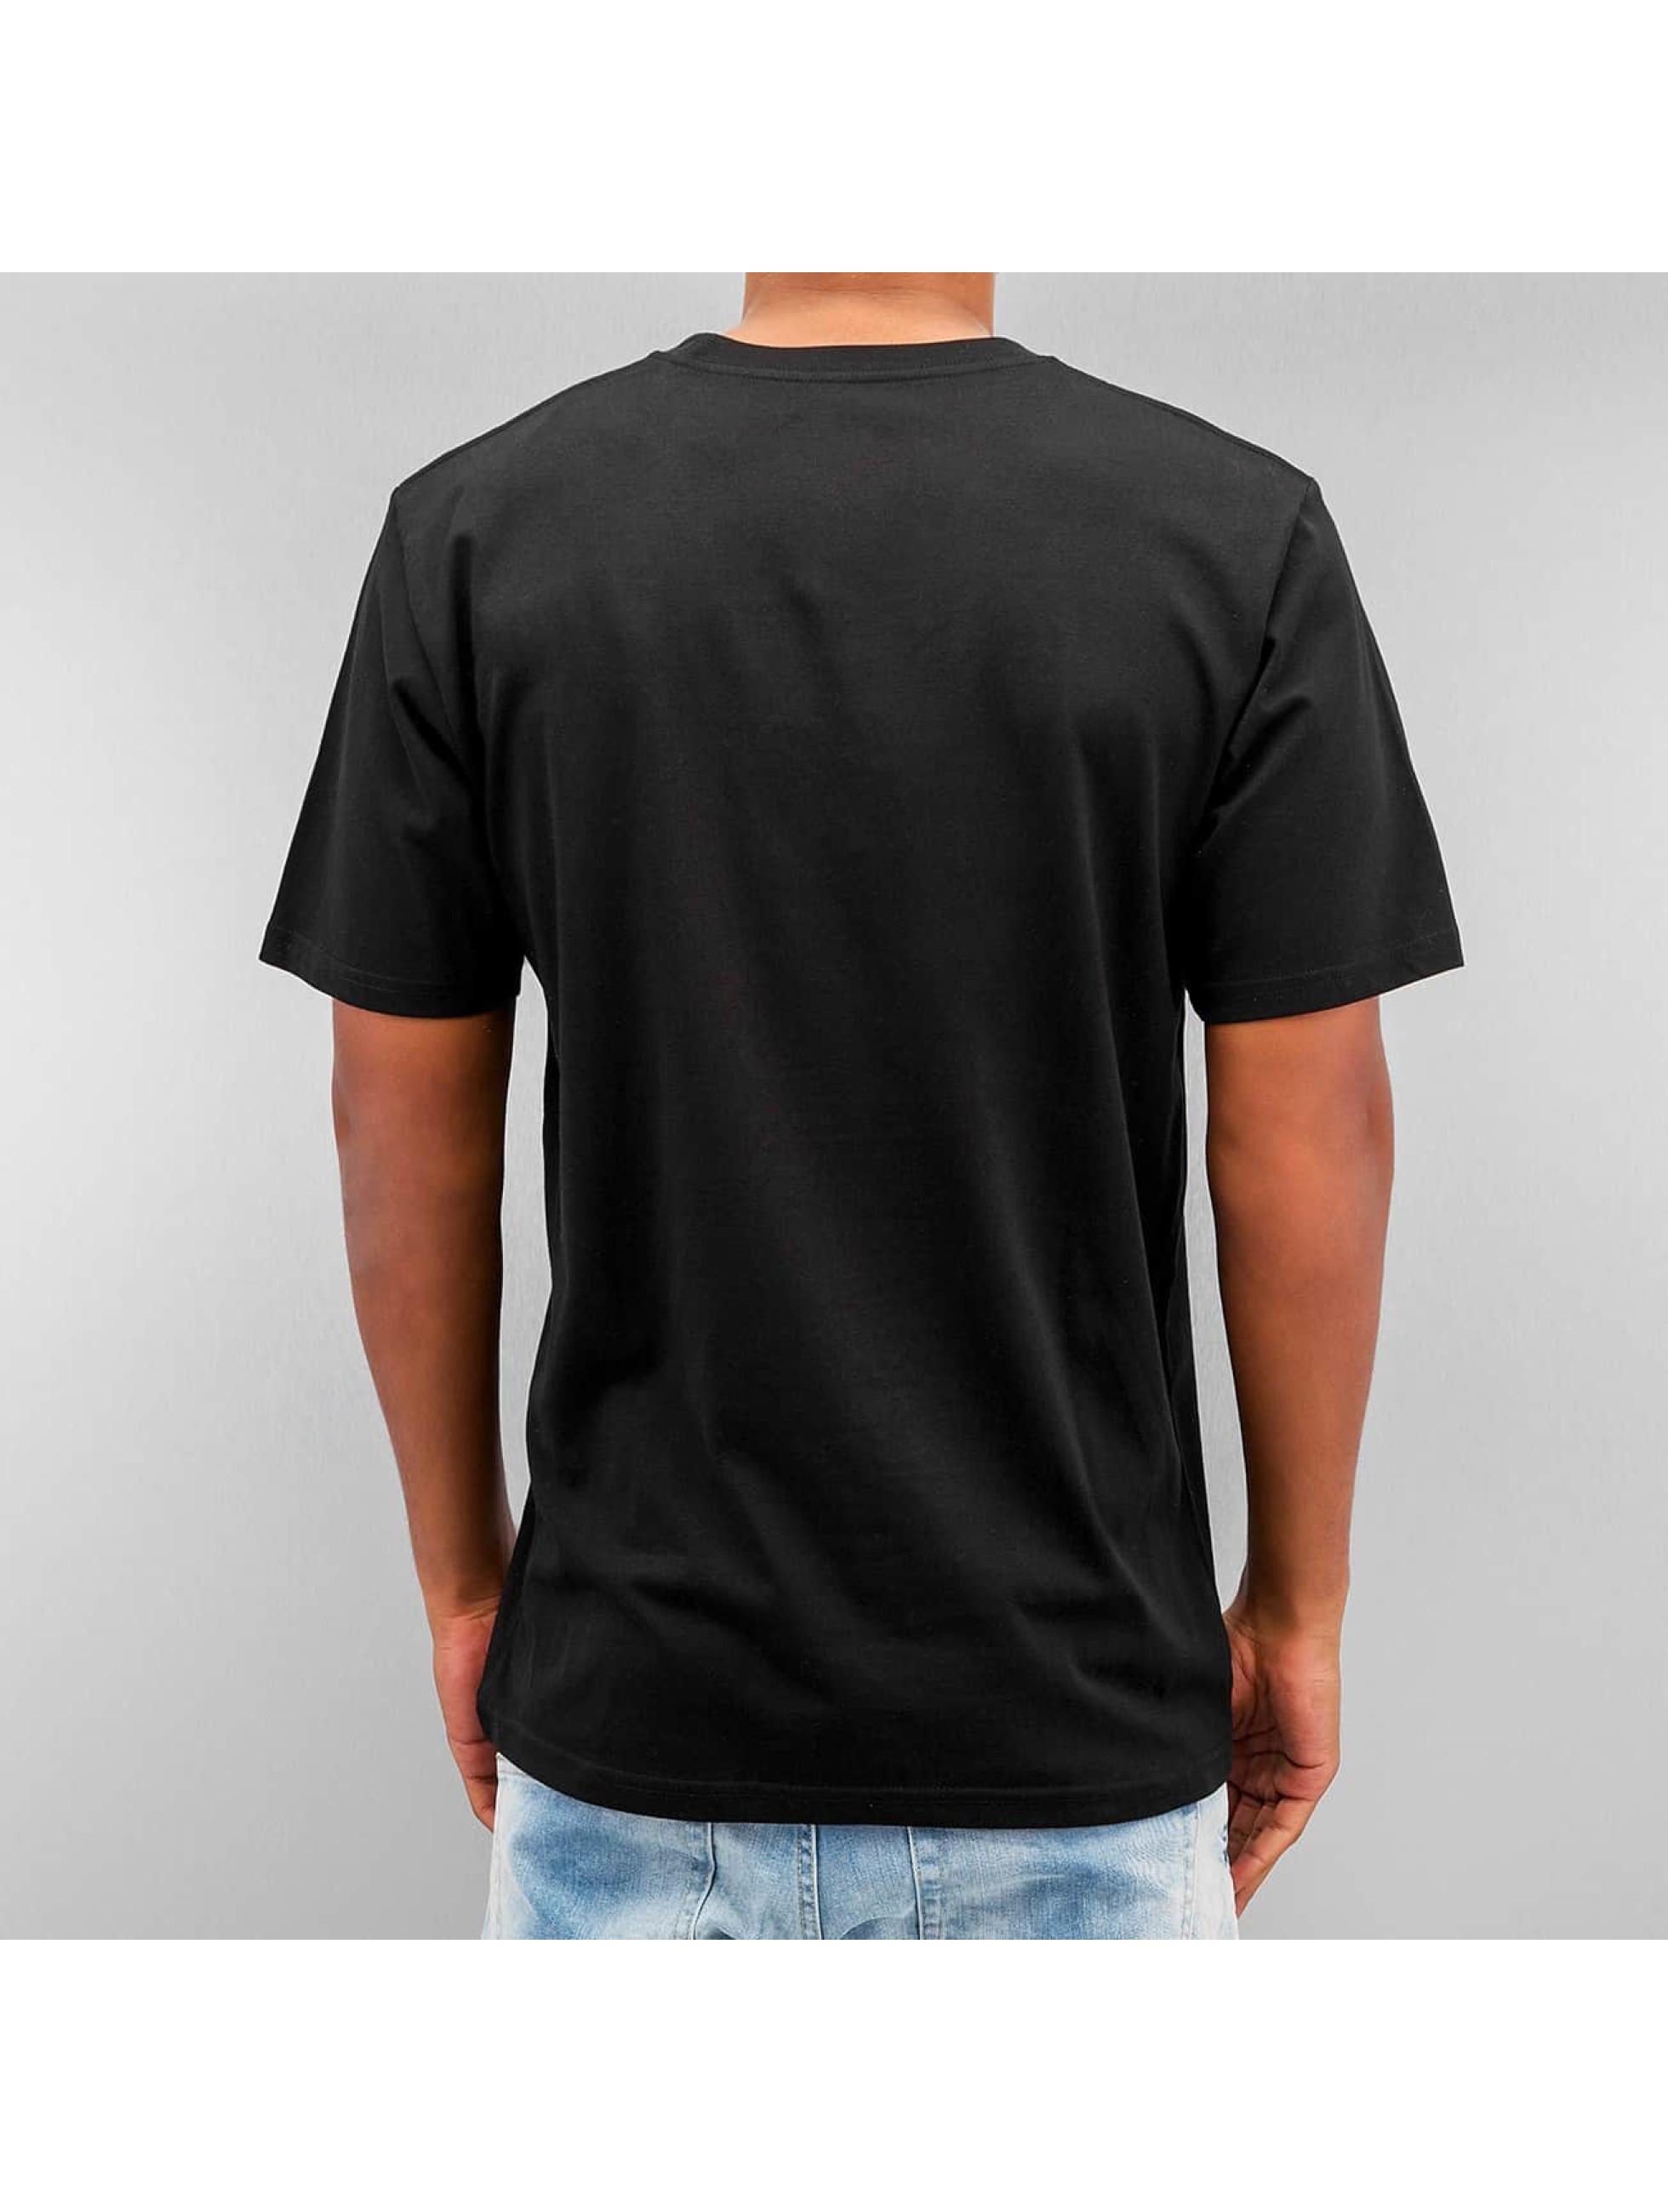 Carhartt WIP T-skjorter S/S Wip Script svart